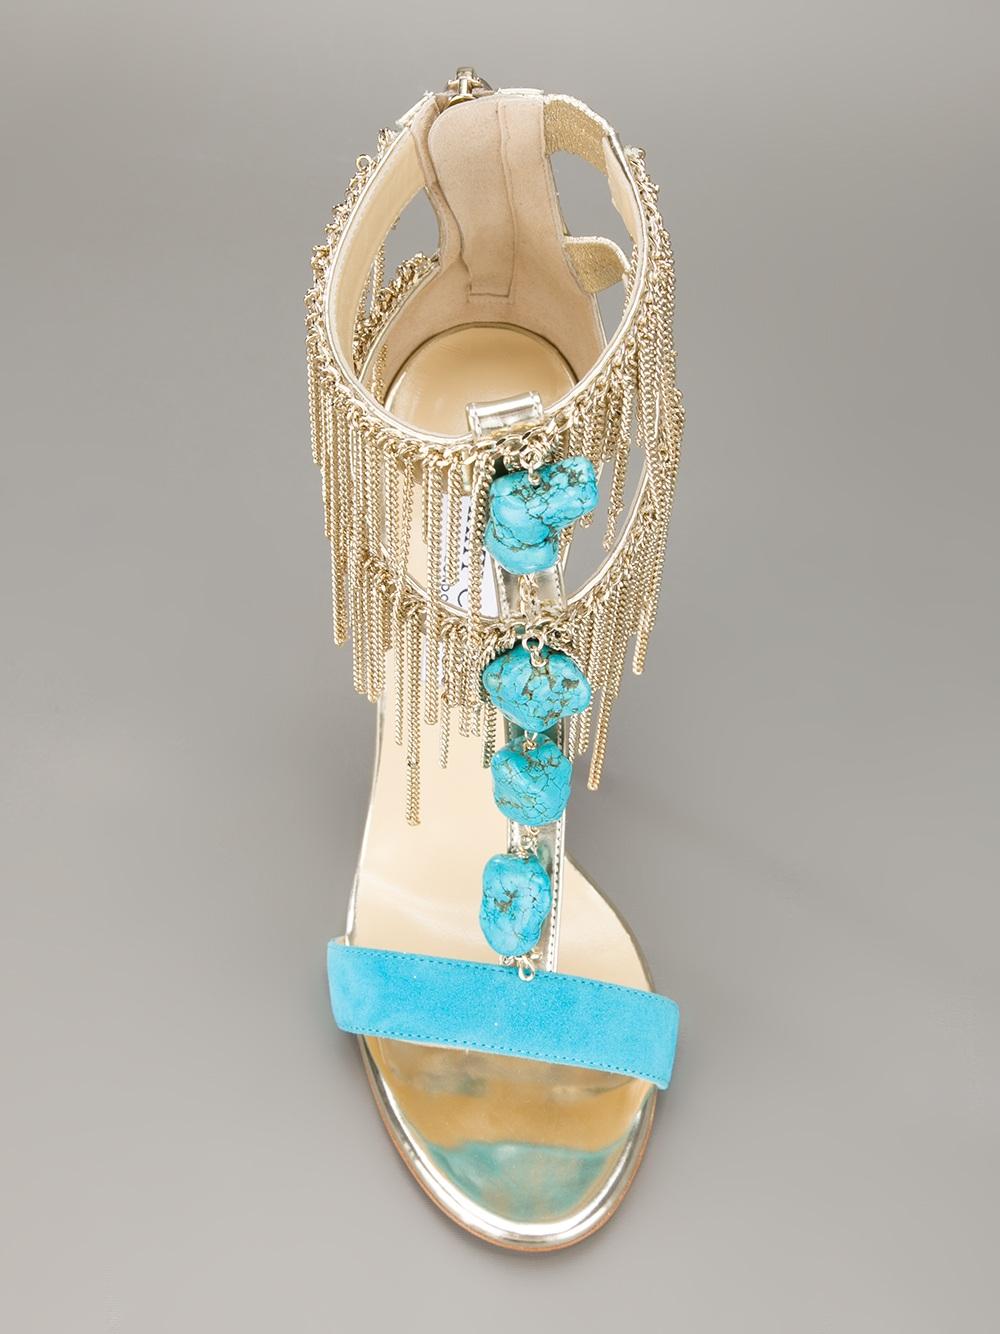 04b875c2da9 Lyst - Jimmy Choo Belle Sandal in Blue